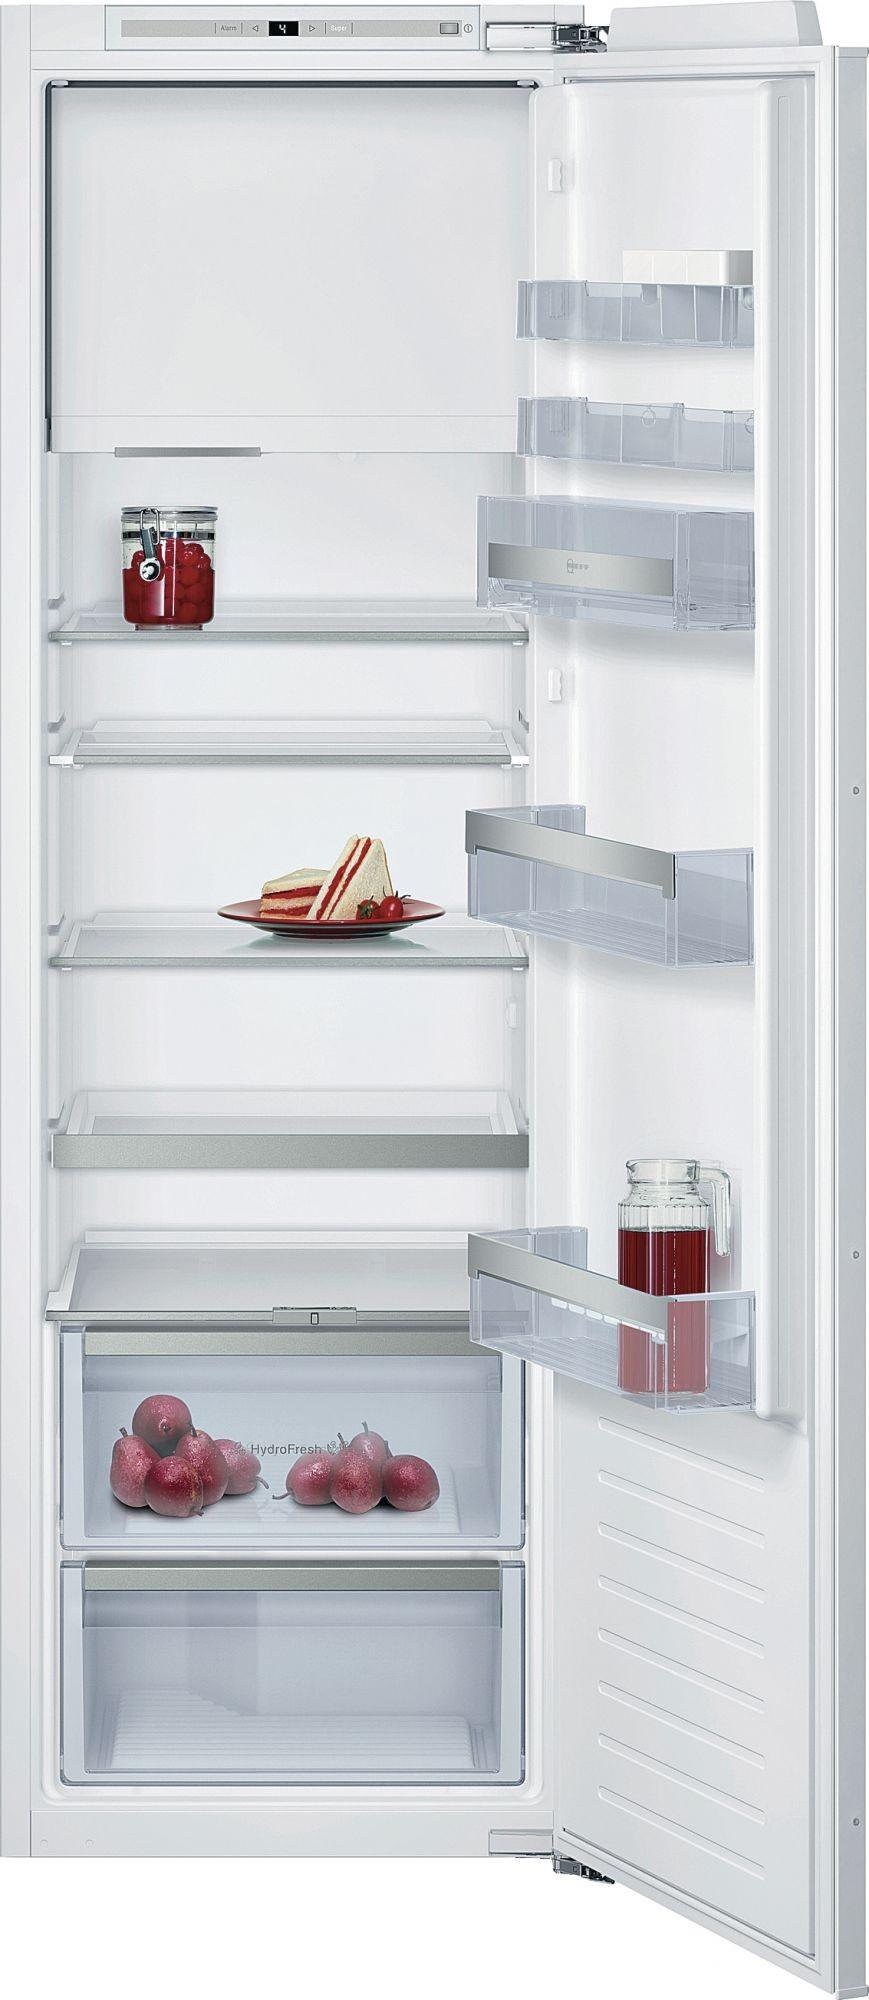 TeamSix - Einbau-Kühlschränke